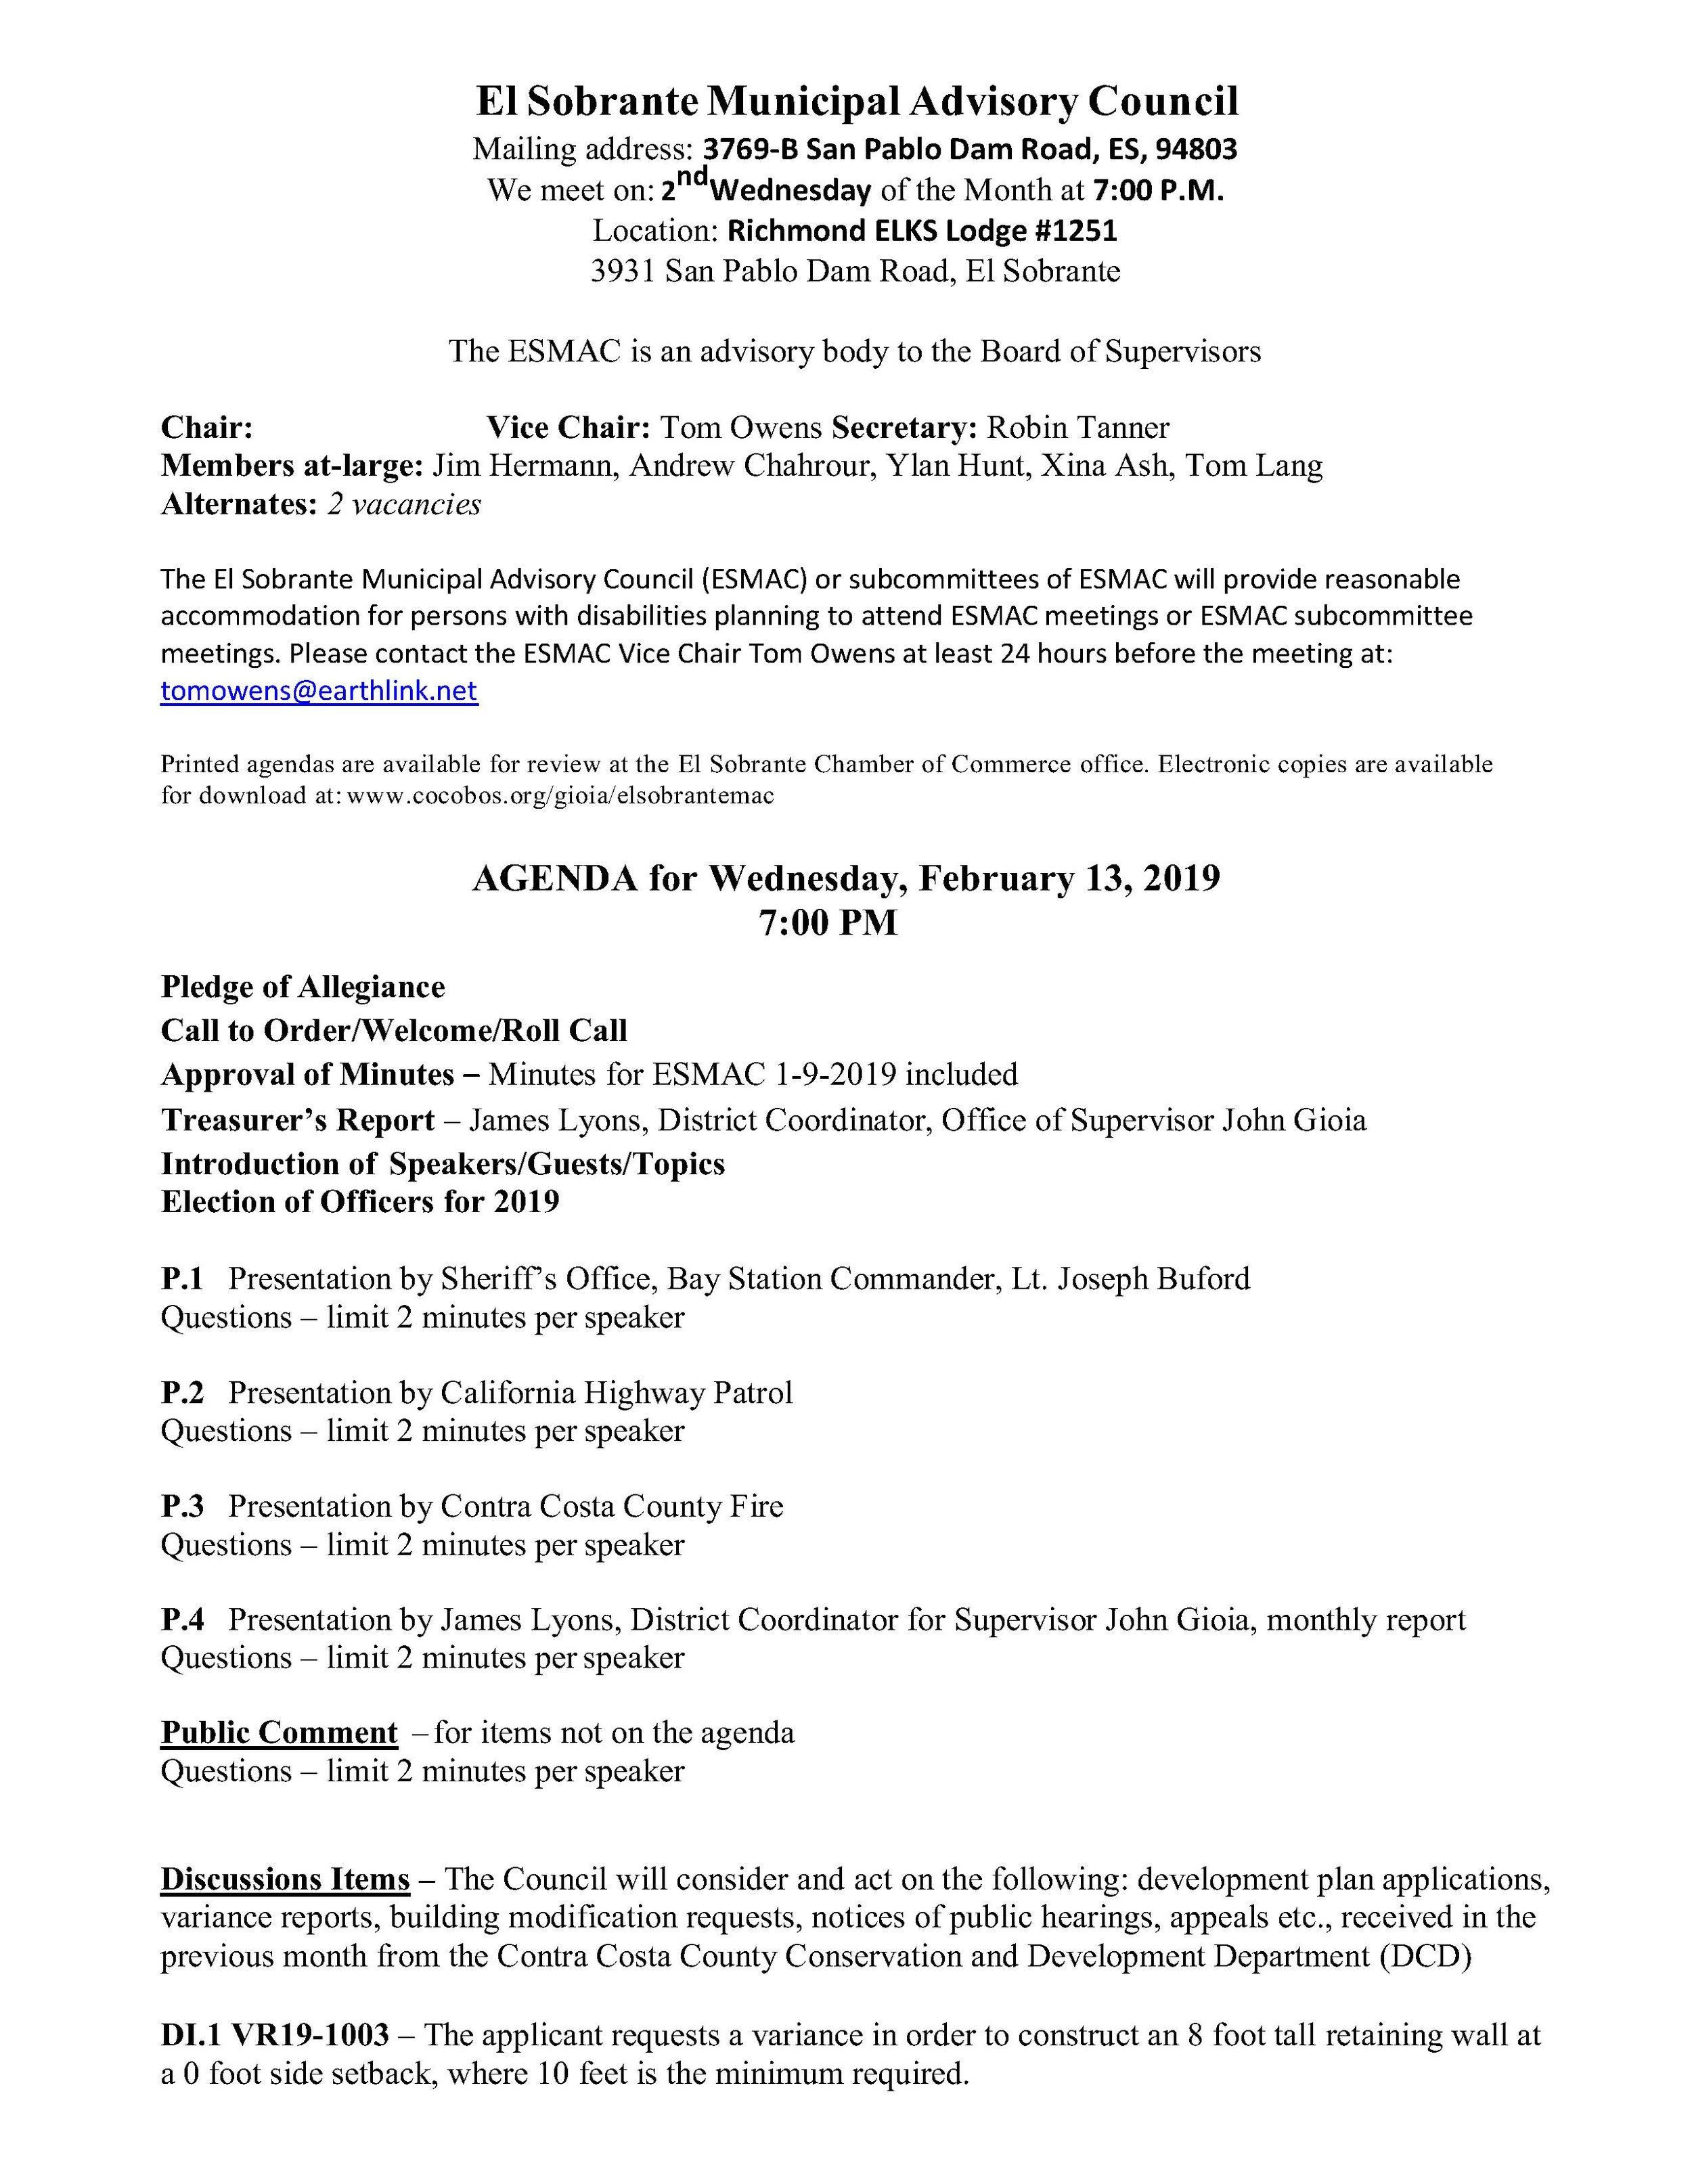 ESMAC Agenda 2.13.2019b_1.jpg